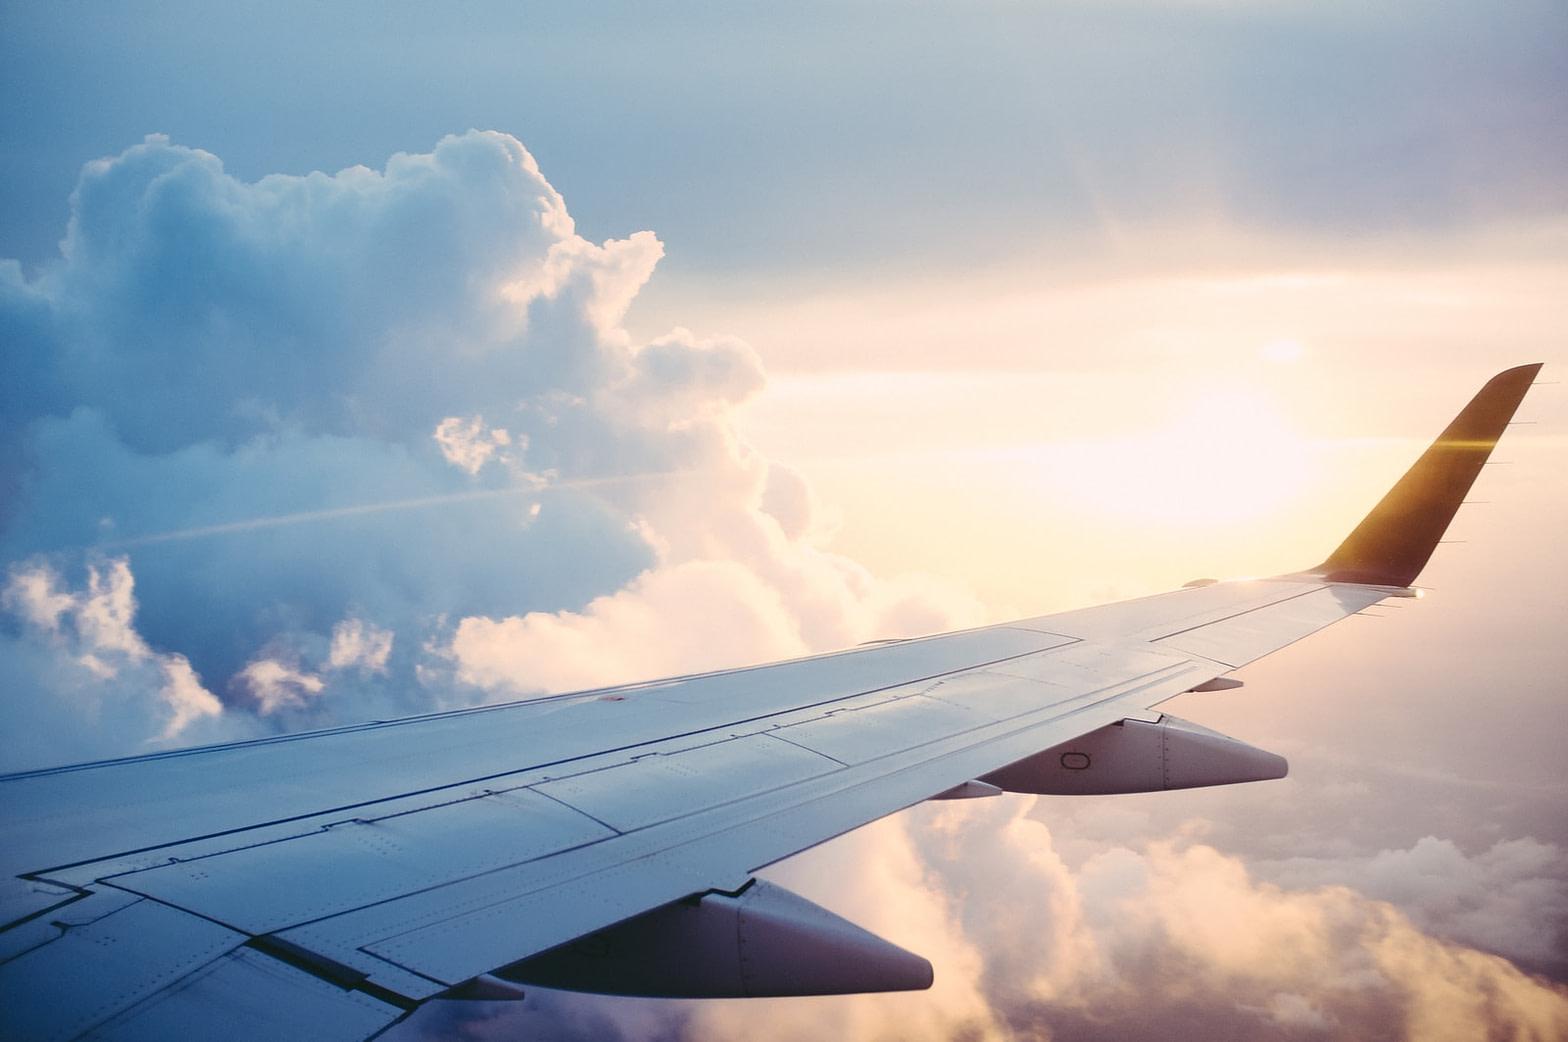 رحلات طيران جيبوتي جدة JIB JED